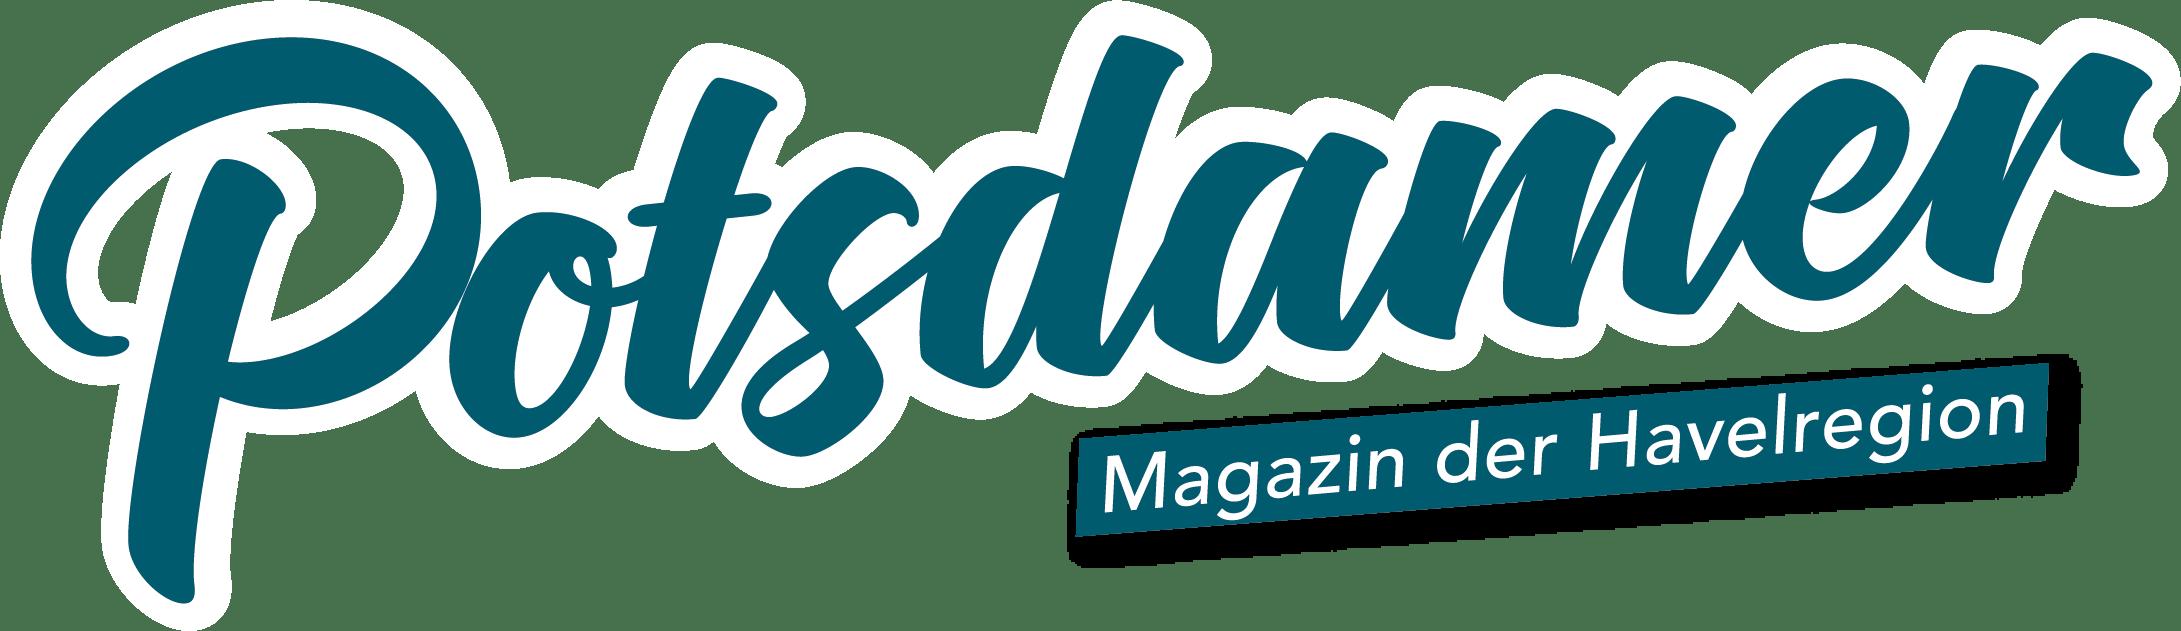 Der Potsdamer – Potsdamer Mediengesellschaft mbH